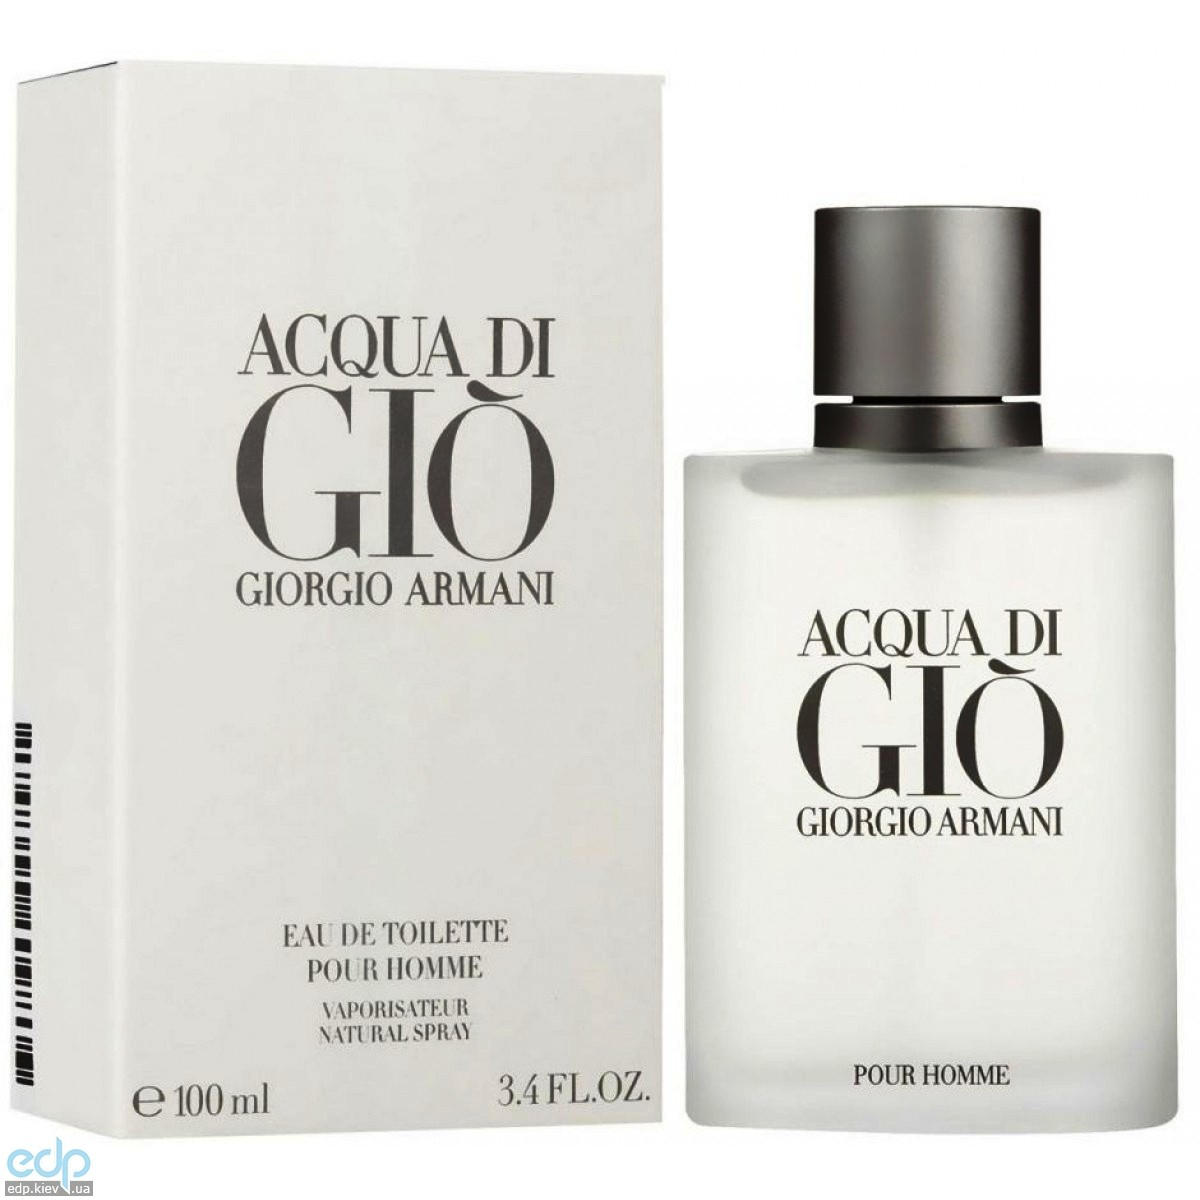 Giorgio Armani Acqua di Gio pour homme -  Набор (туалетная вода 100 + гель для душа 50 + бальзам после бритья 50)